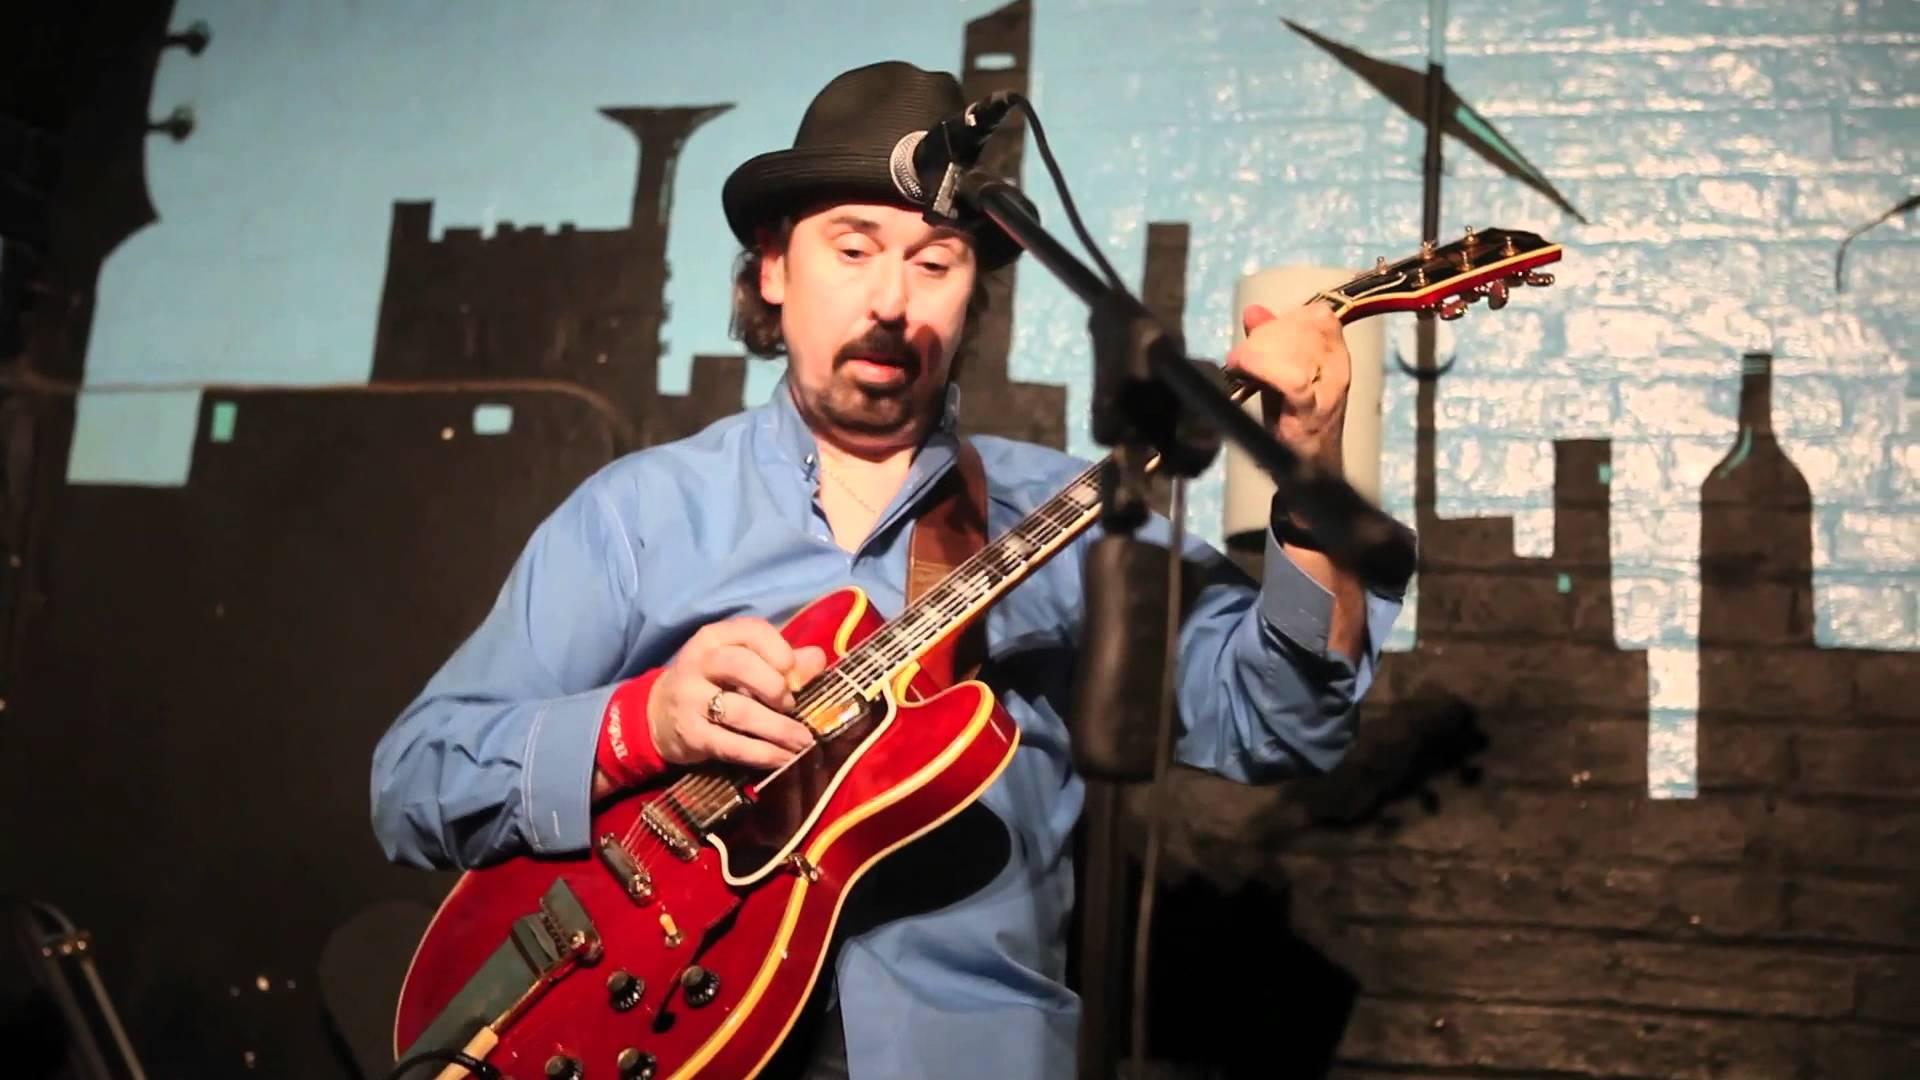 The<br>Hamburg Blues Band